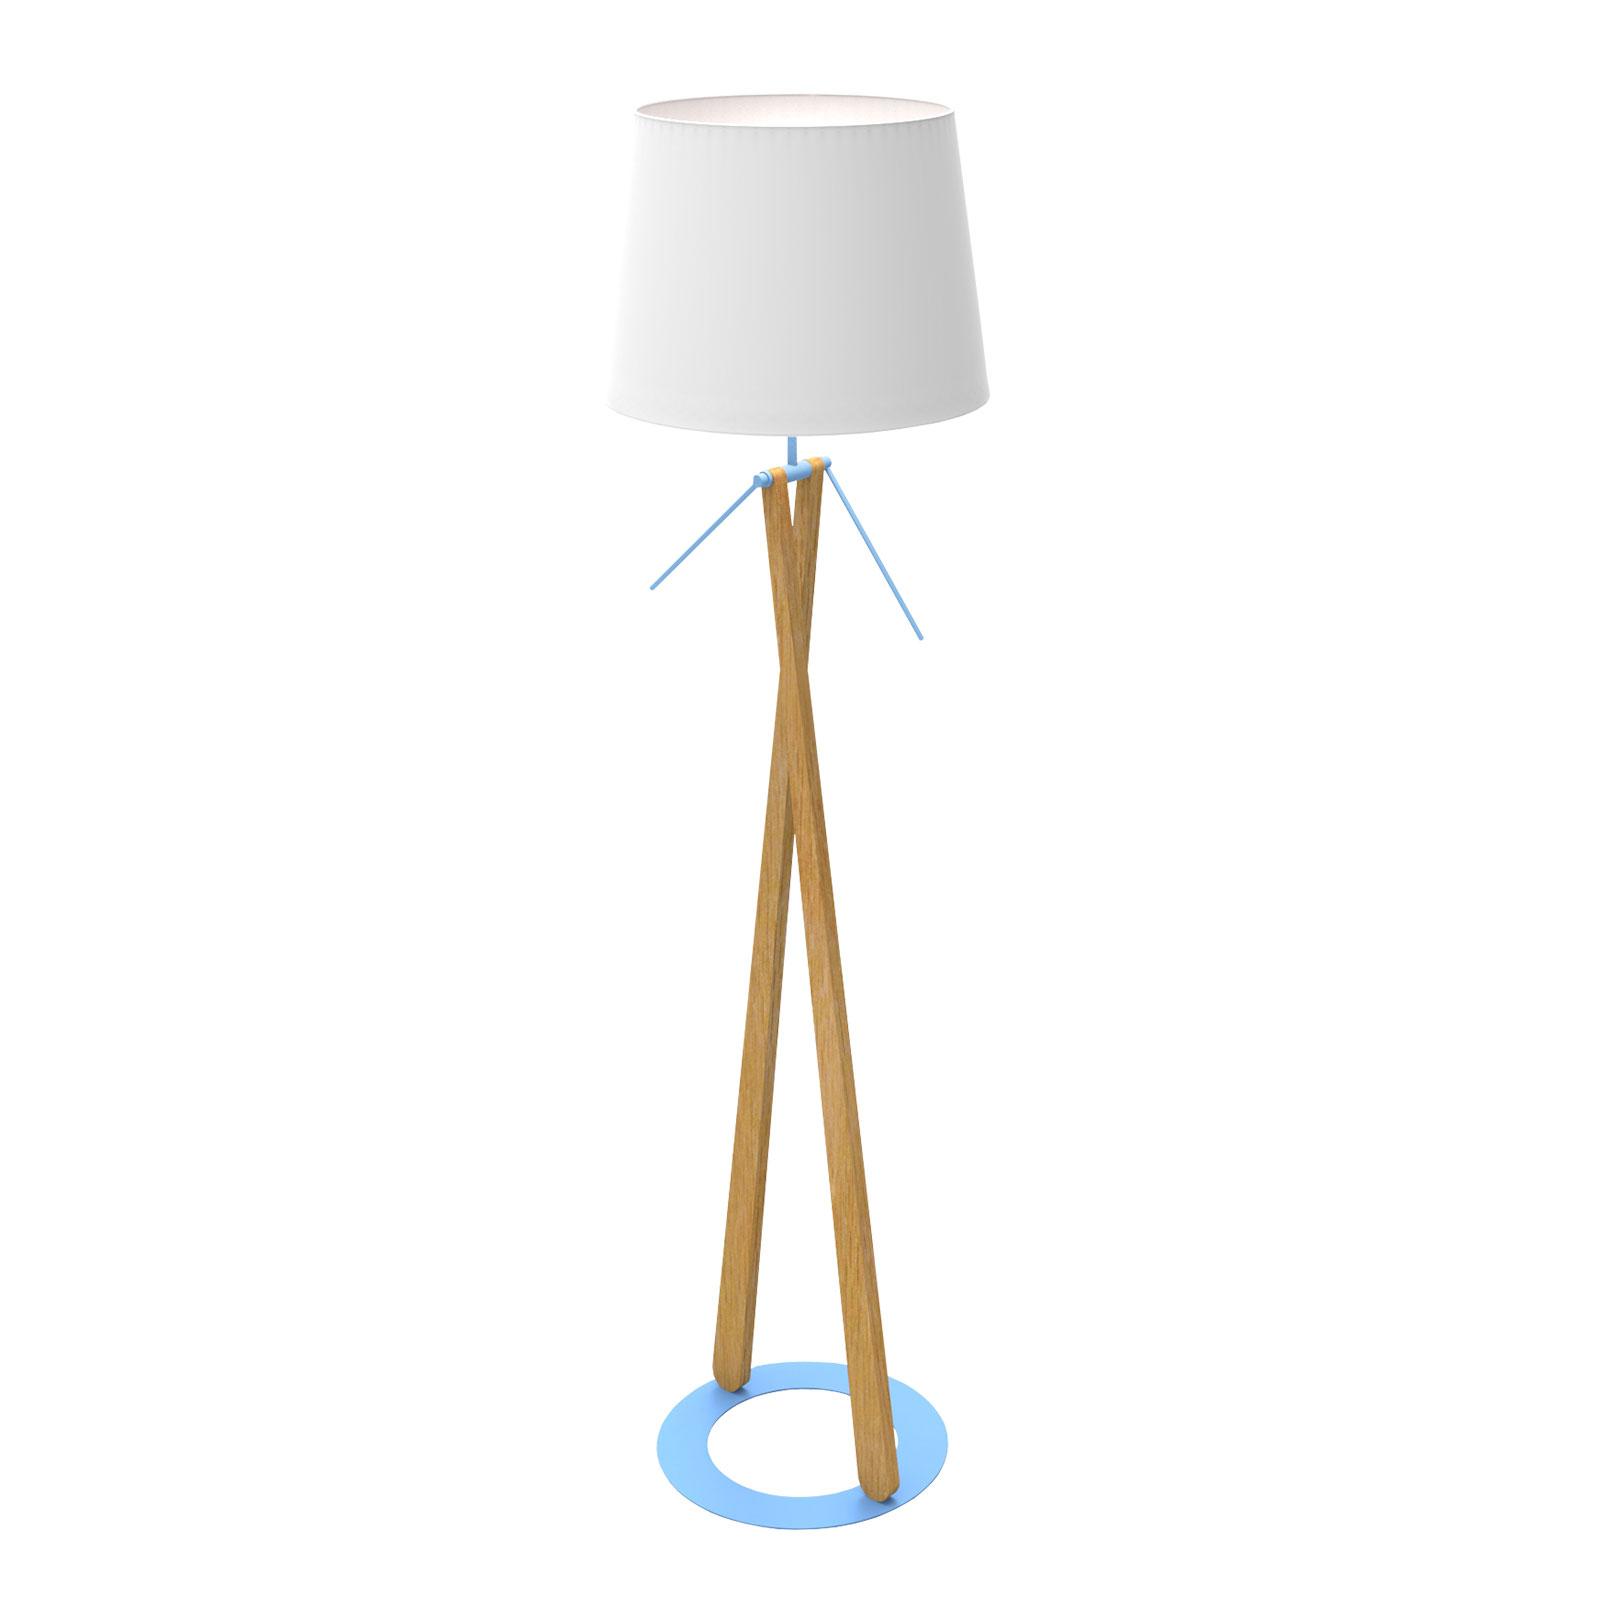 Vloerlamp Zazou LS, textiel-kap, blauwe lamphouder